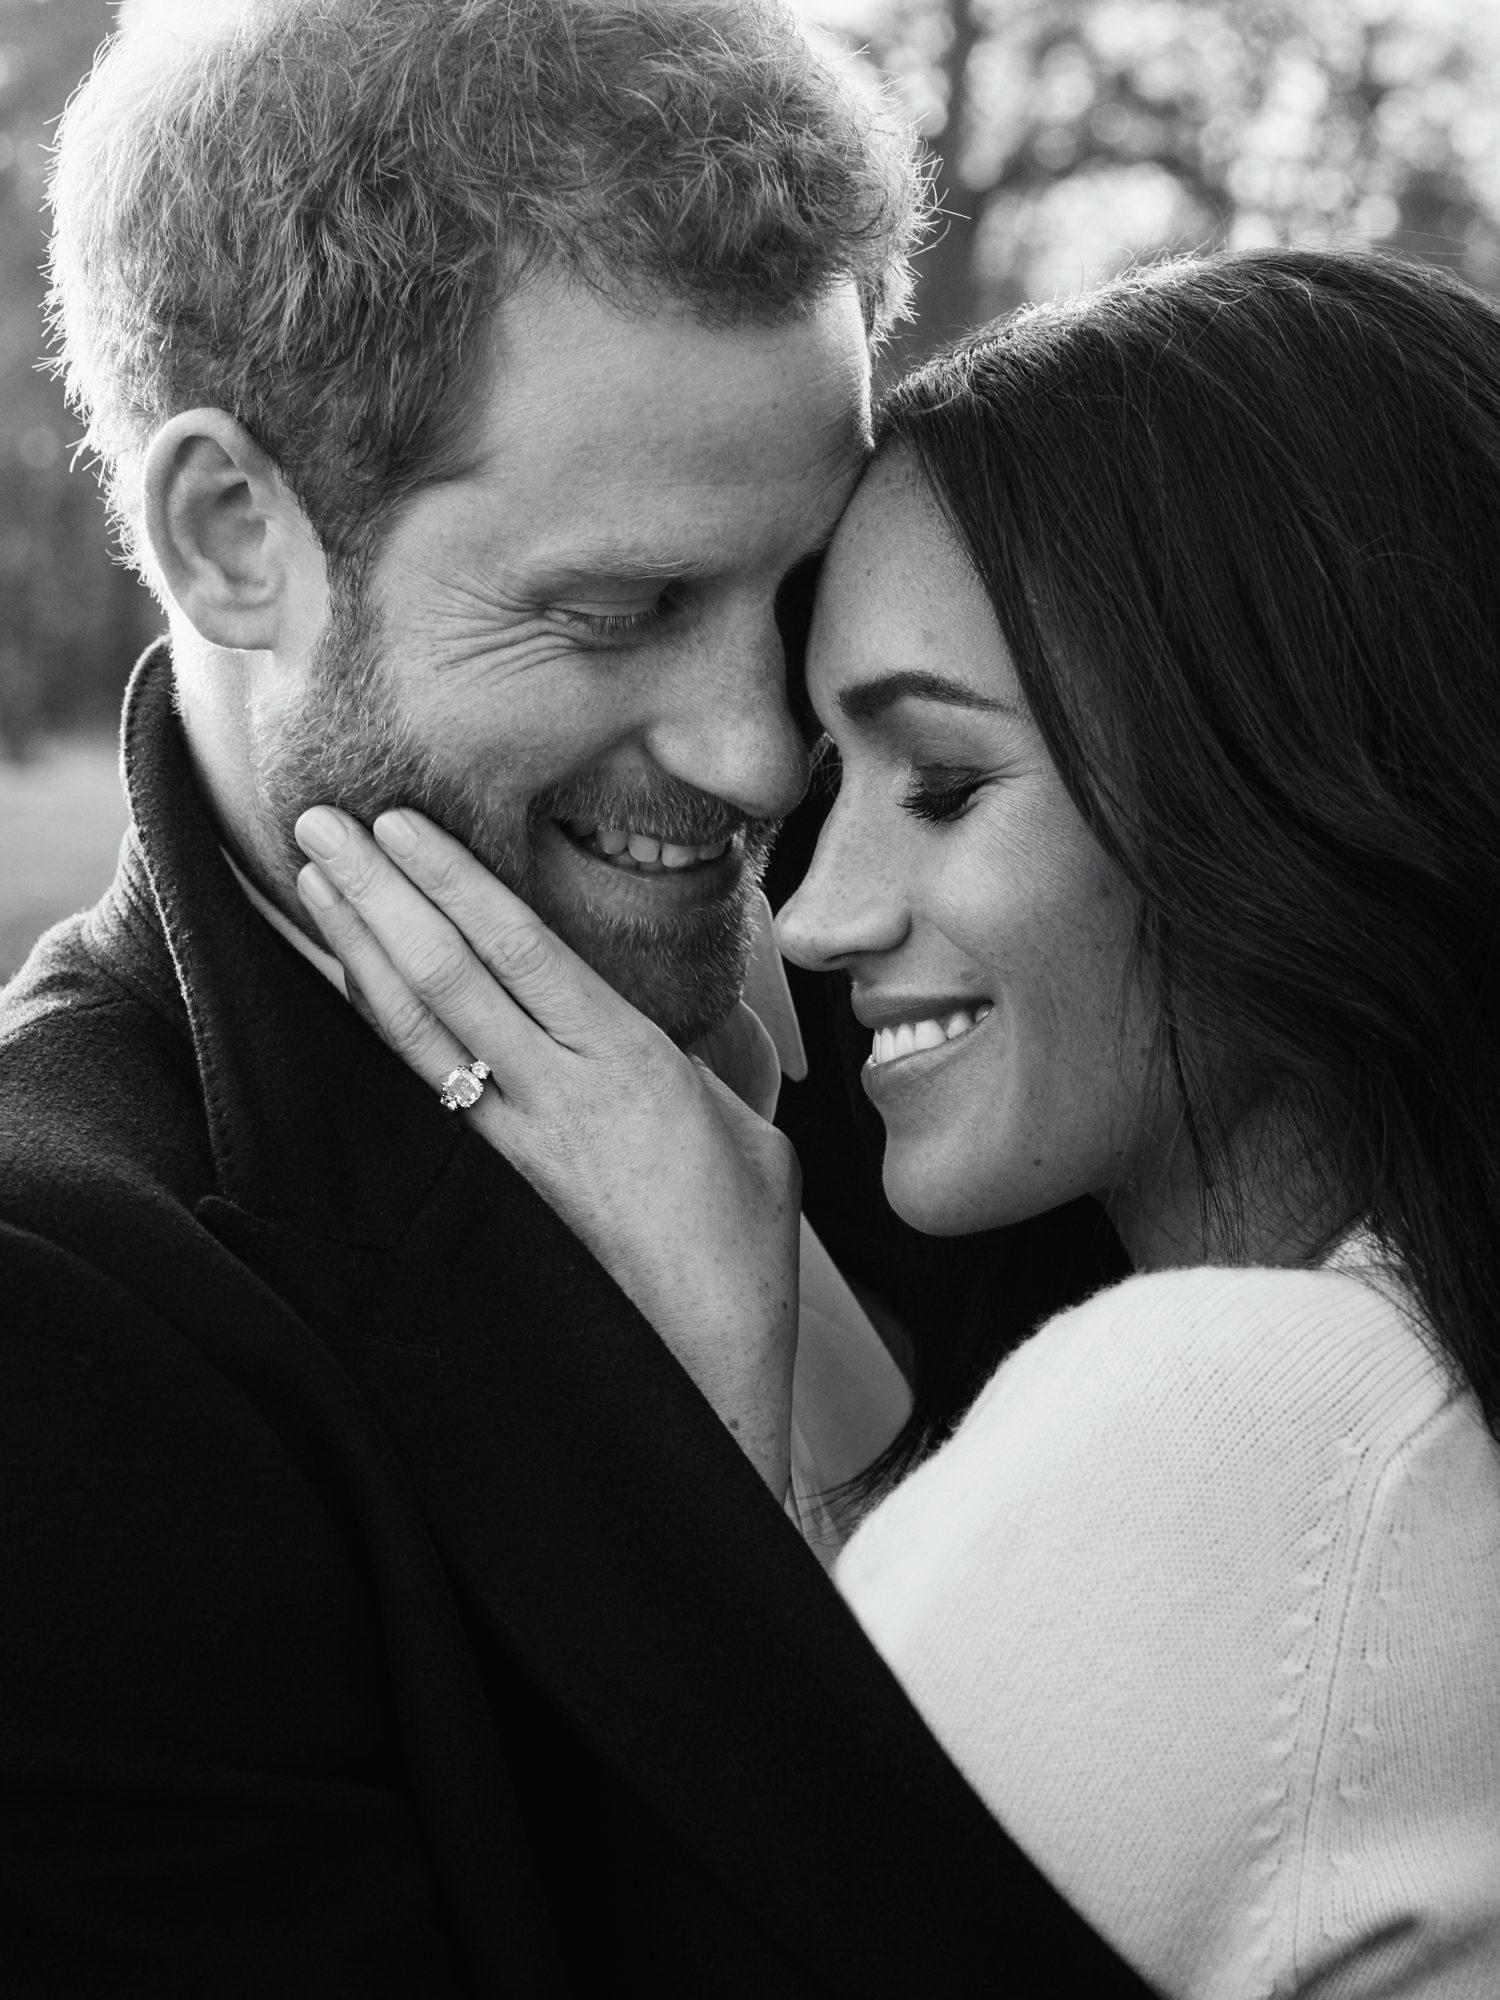 meghan-markle-prince-harry-engagement-photos.jpg